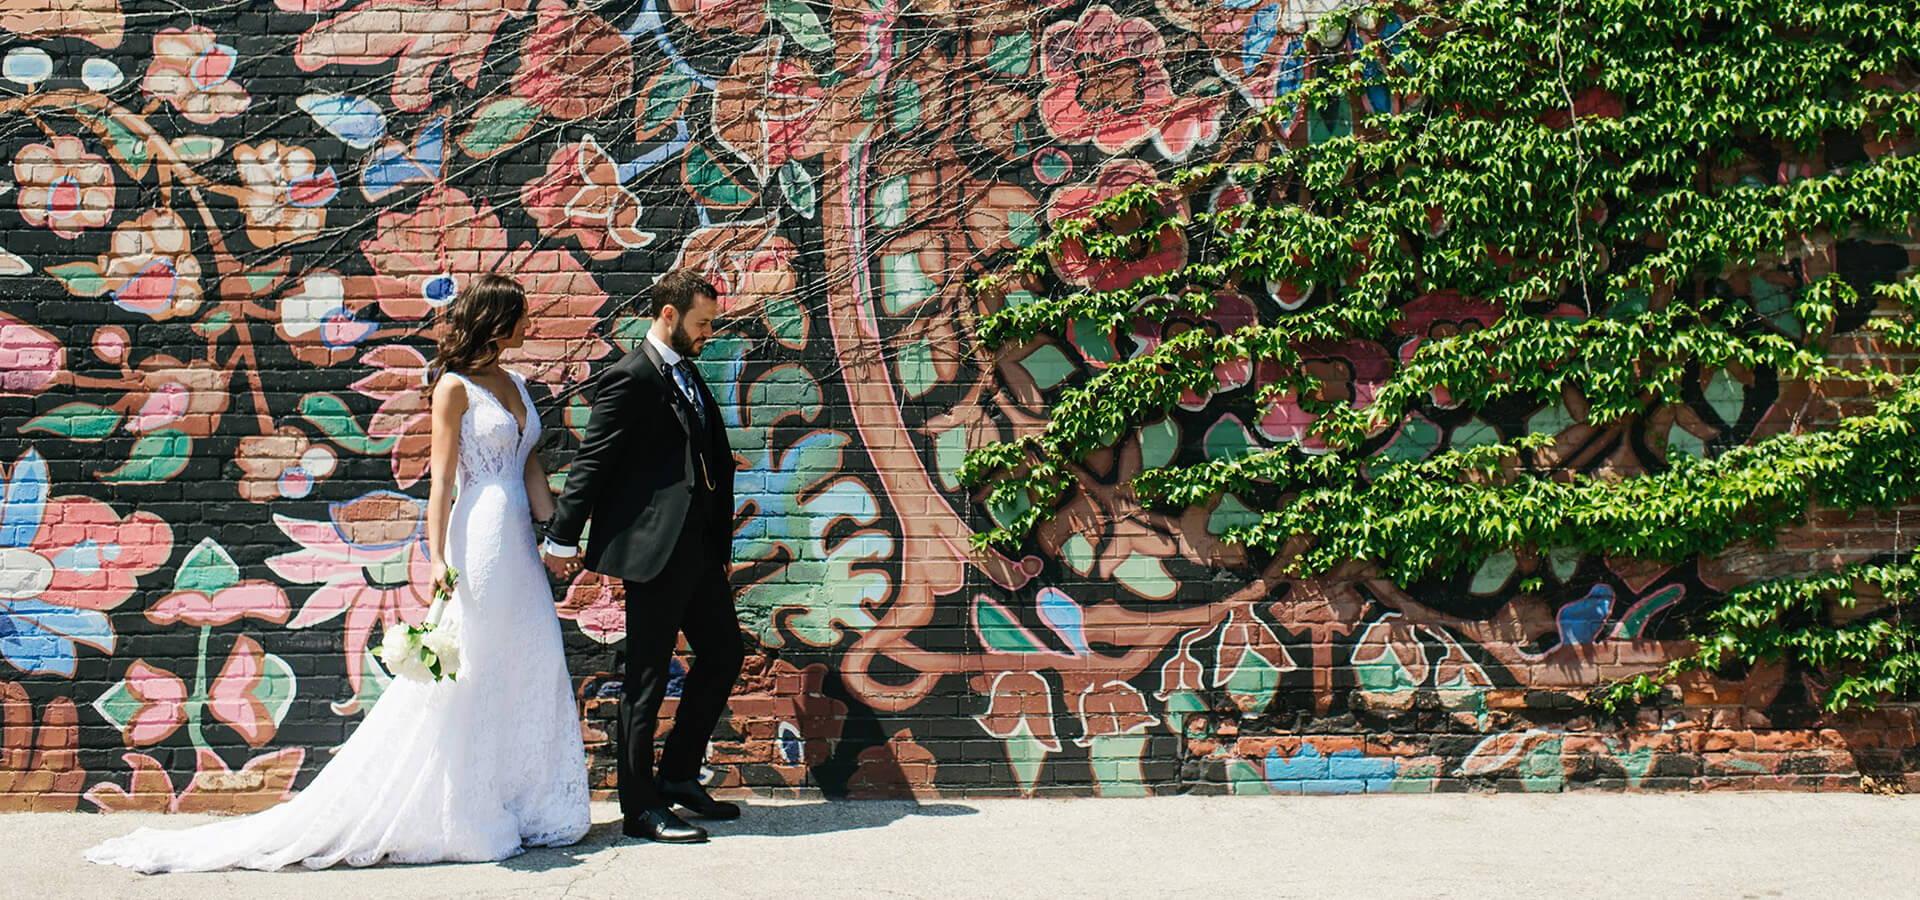 Hero image for Jayme and Kyle's Modern City Wedding at 99 Sudbury